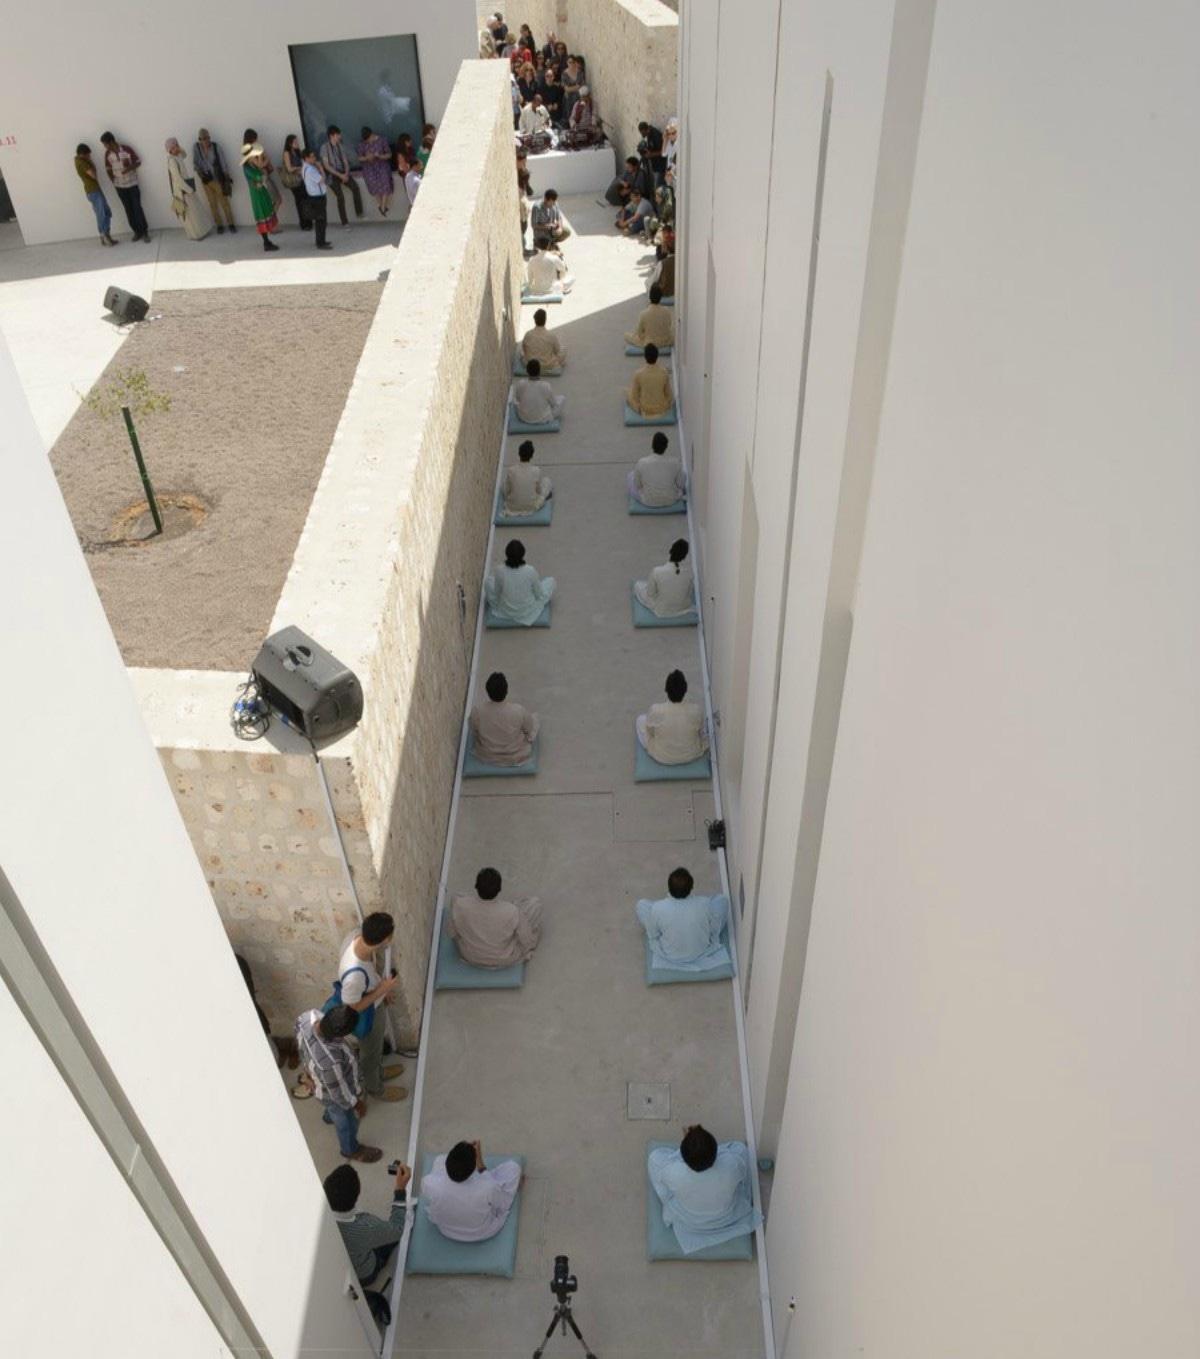 Wael Shawky, Dictums, Sharjah Biennale 2013